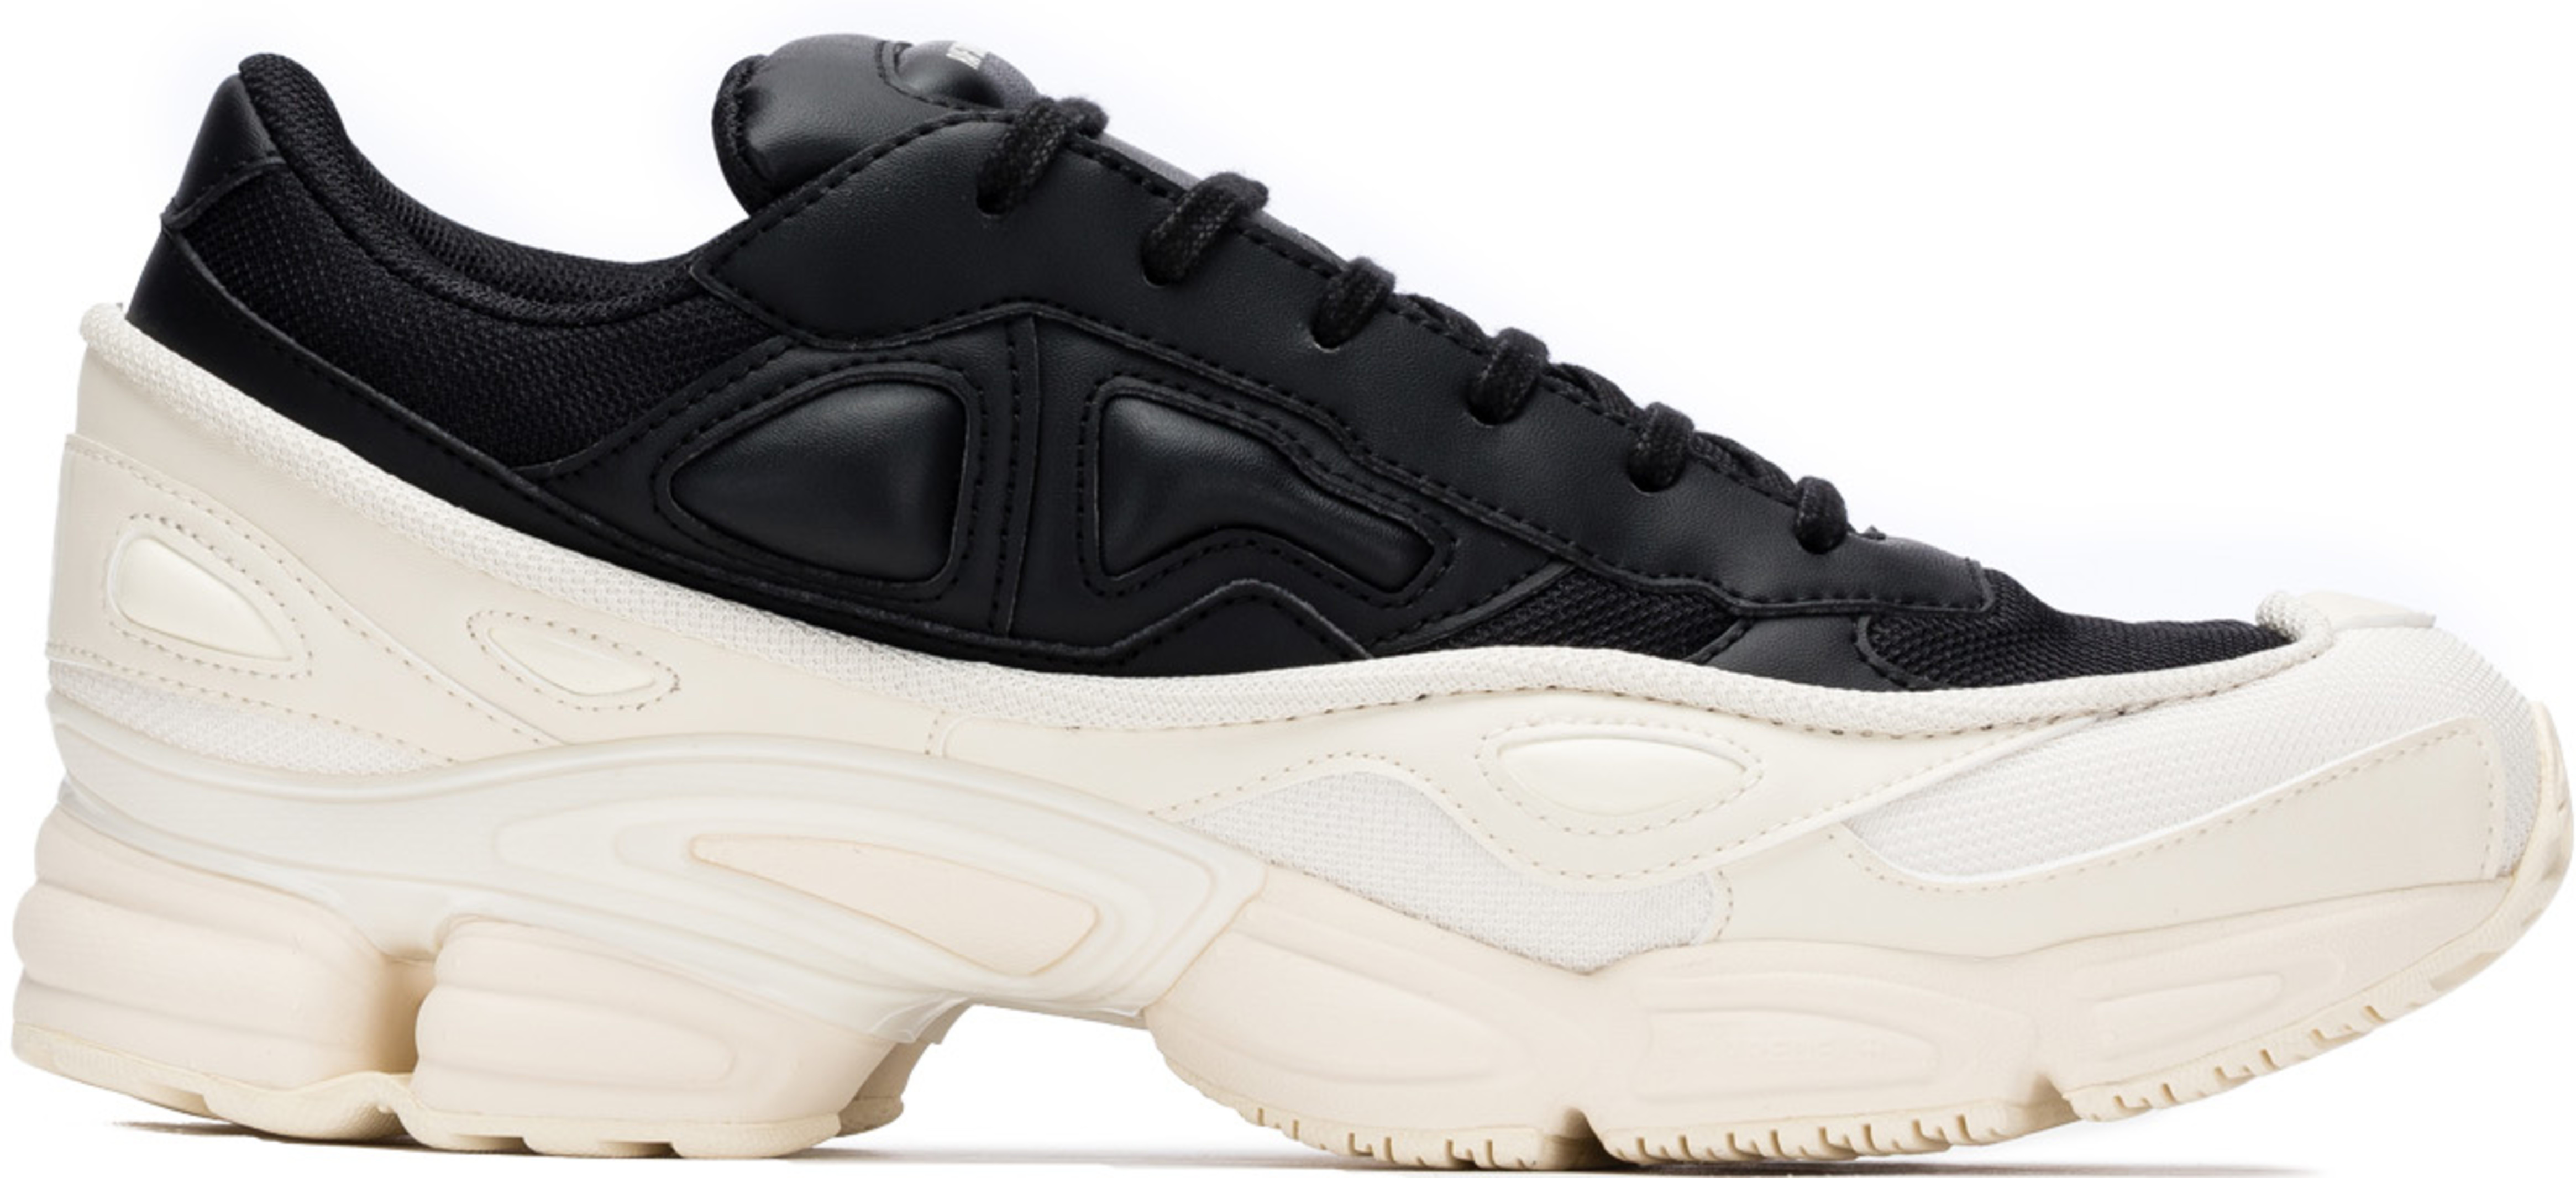 sports shoes 3cd1e 91519 adidas by Raf Simons - Raf Simons Ozweego - Cream White/Core Black/Core  Black